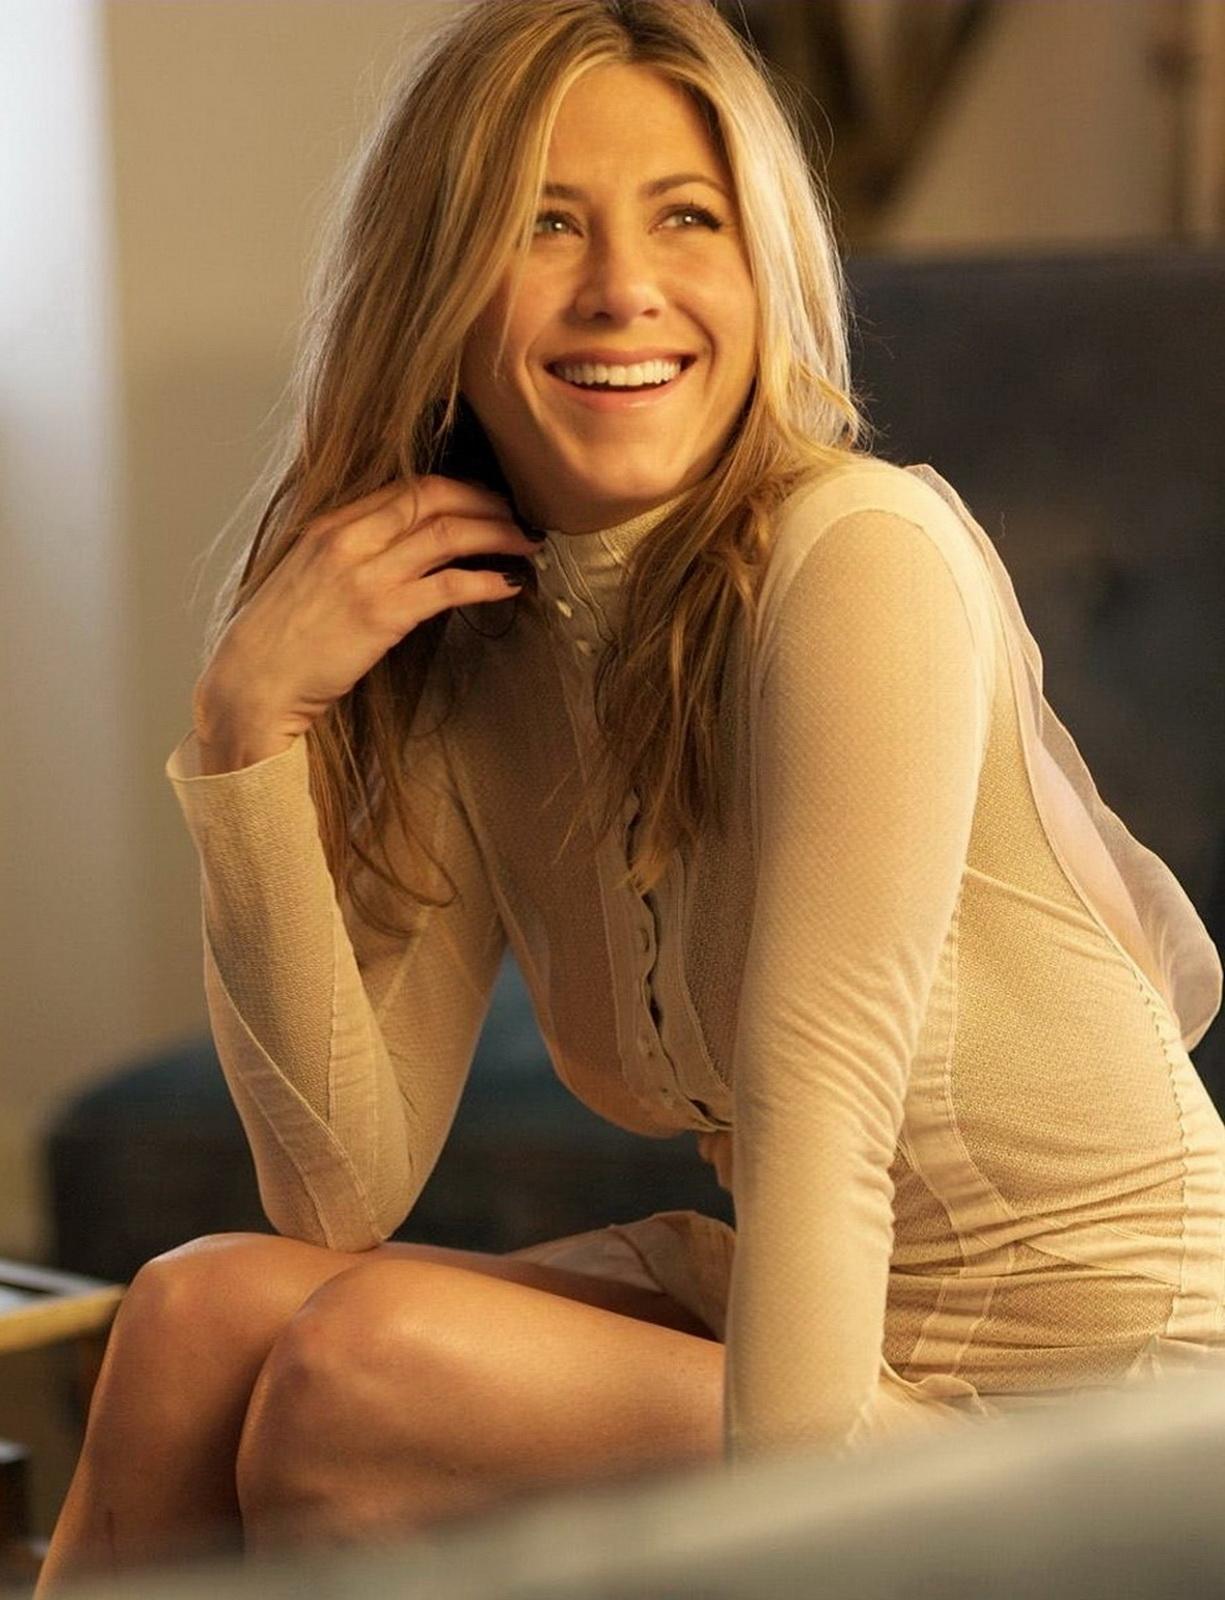 Memek Plus: Jennifer Aniston sexy see through dress nipple ...